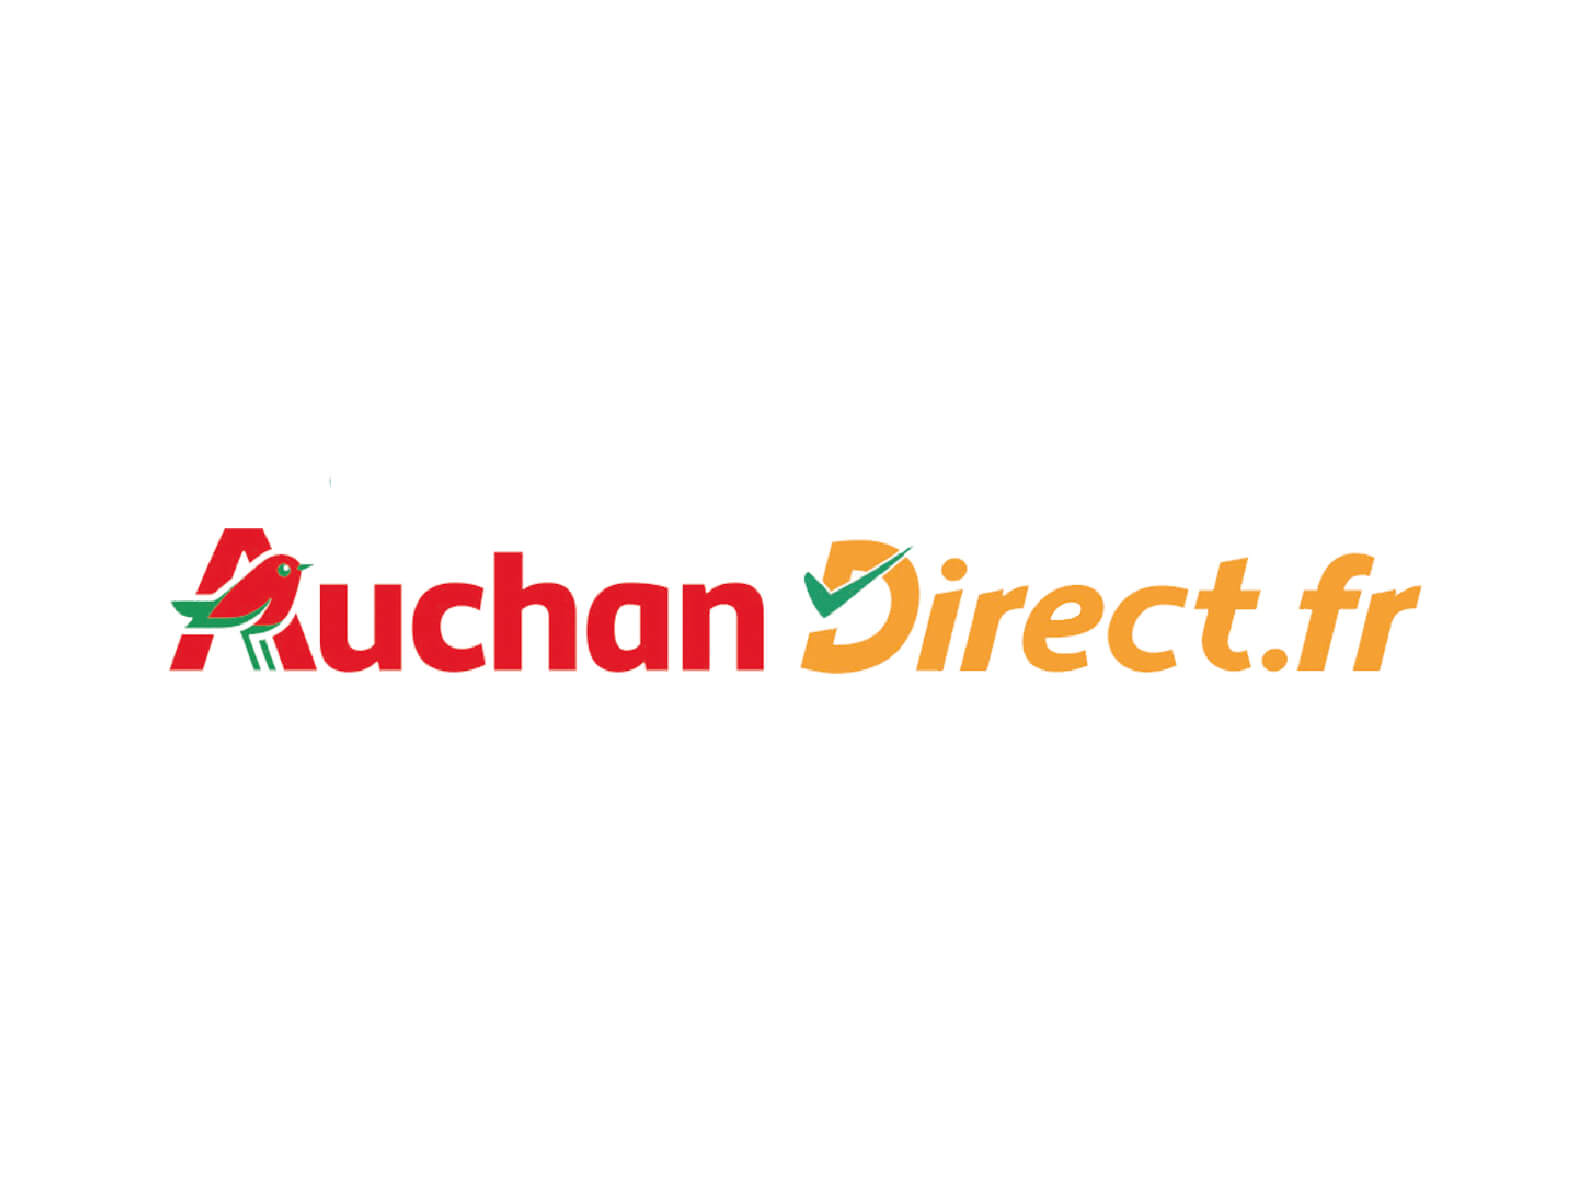 agence kayak communication web lille nord auchan direct logo